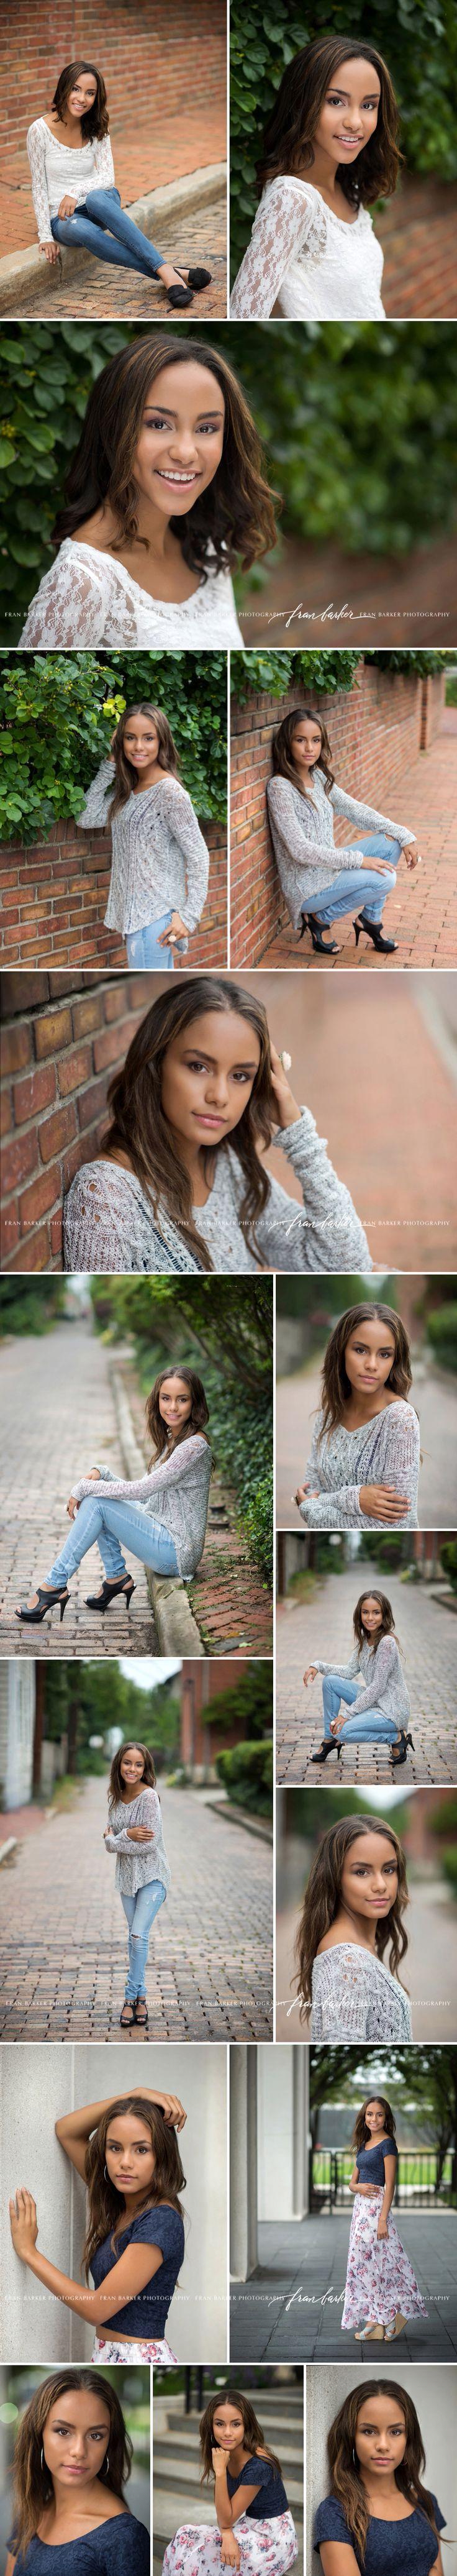 Teen Modeling Headshots Columbus Family Portrait Photographer